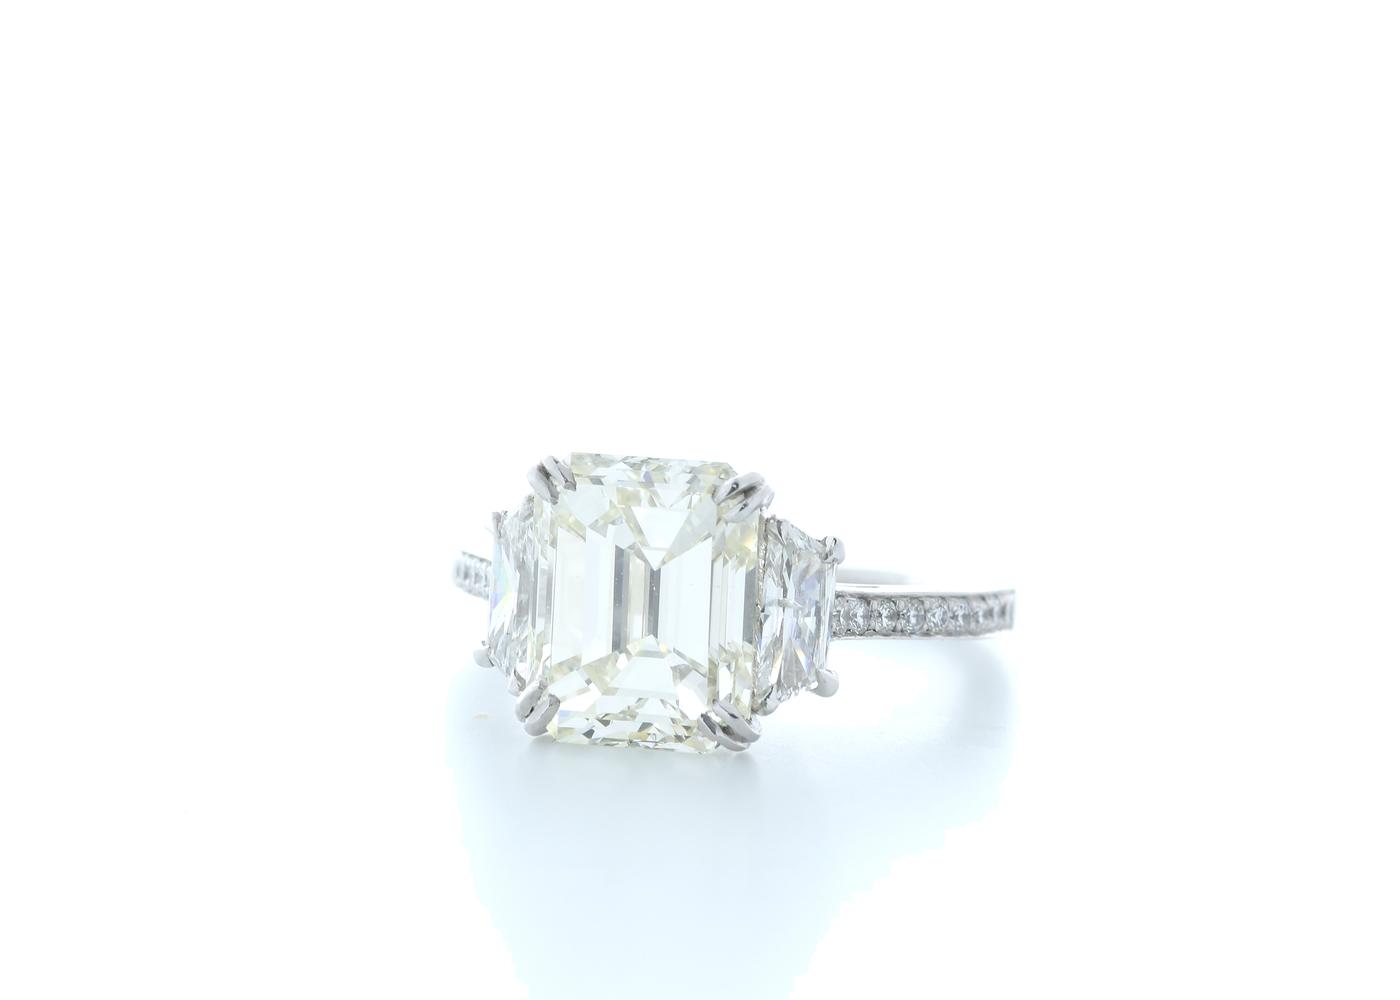 18ct White Gold Emerald Cut Diamond Ring 5.31 (4.56) Carats - Image 2 of 5